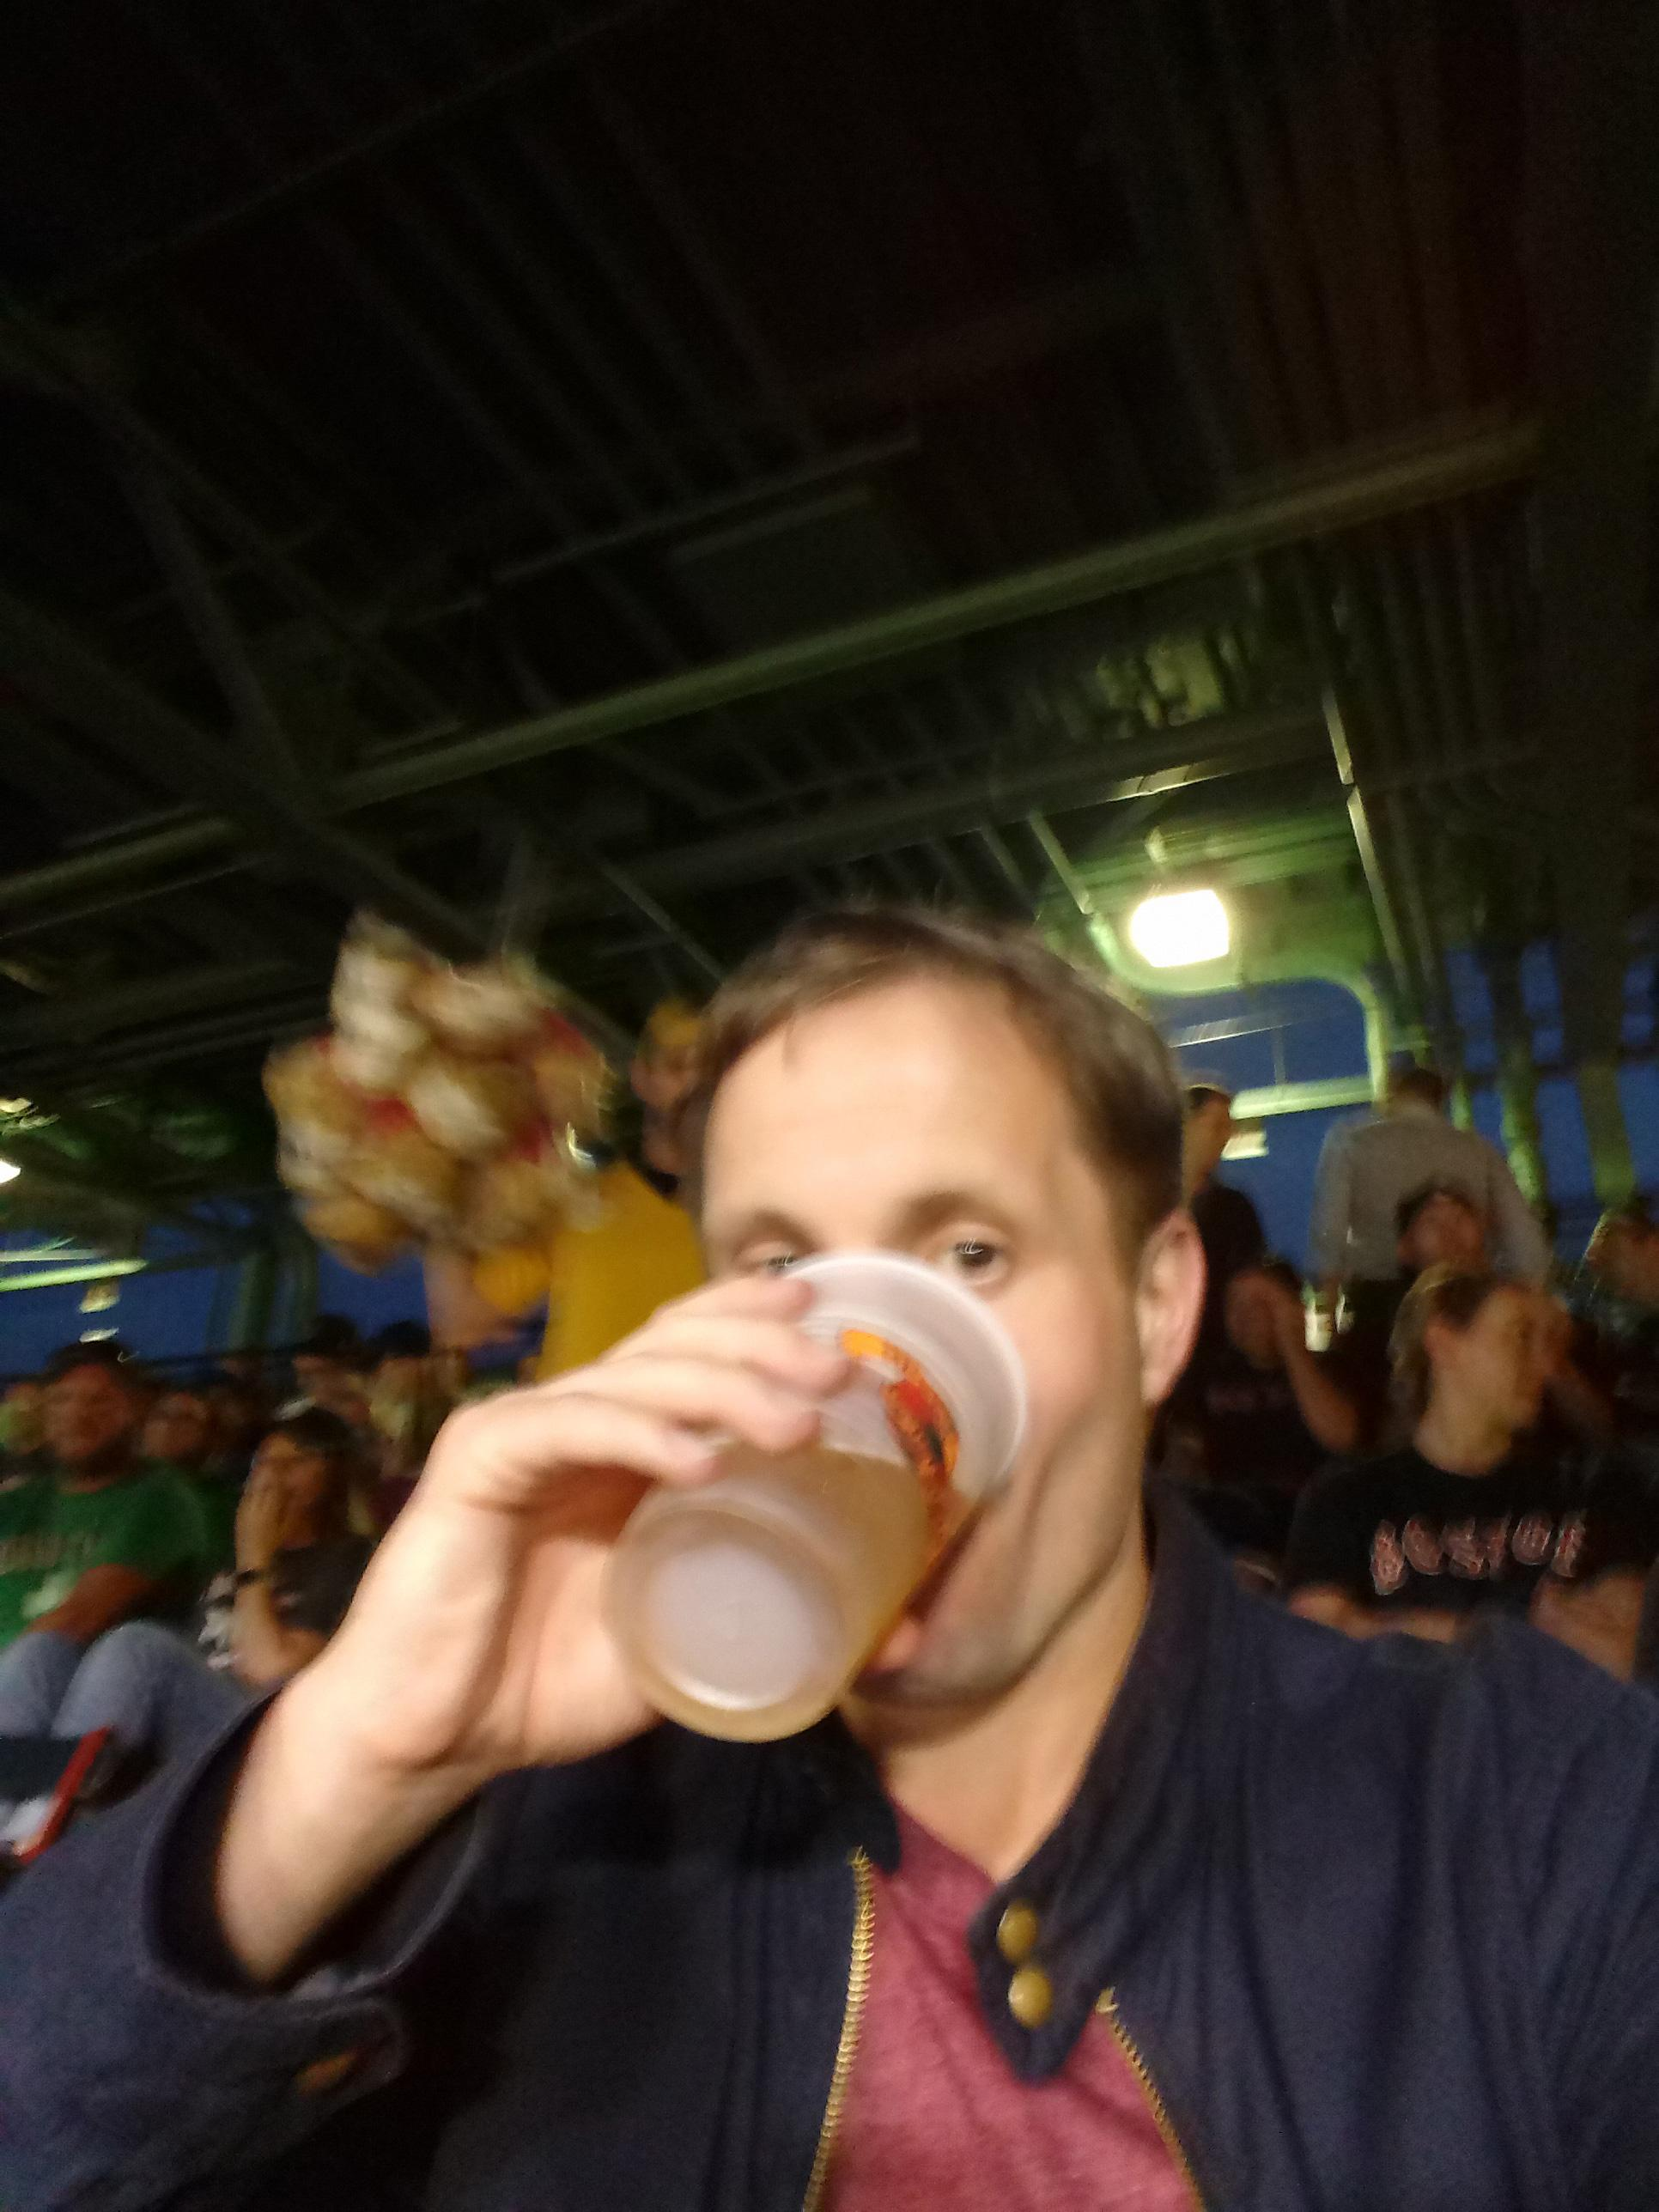 Phil Gradwell enjoys a beer at Fenway Park